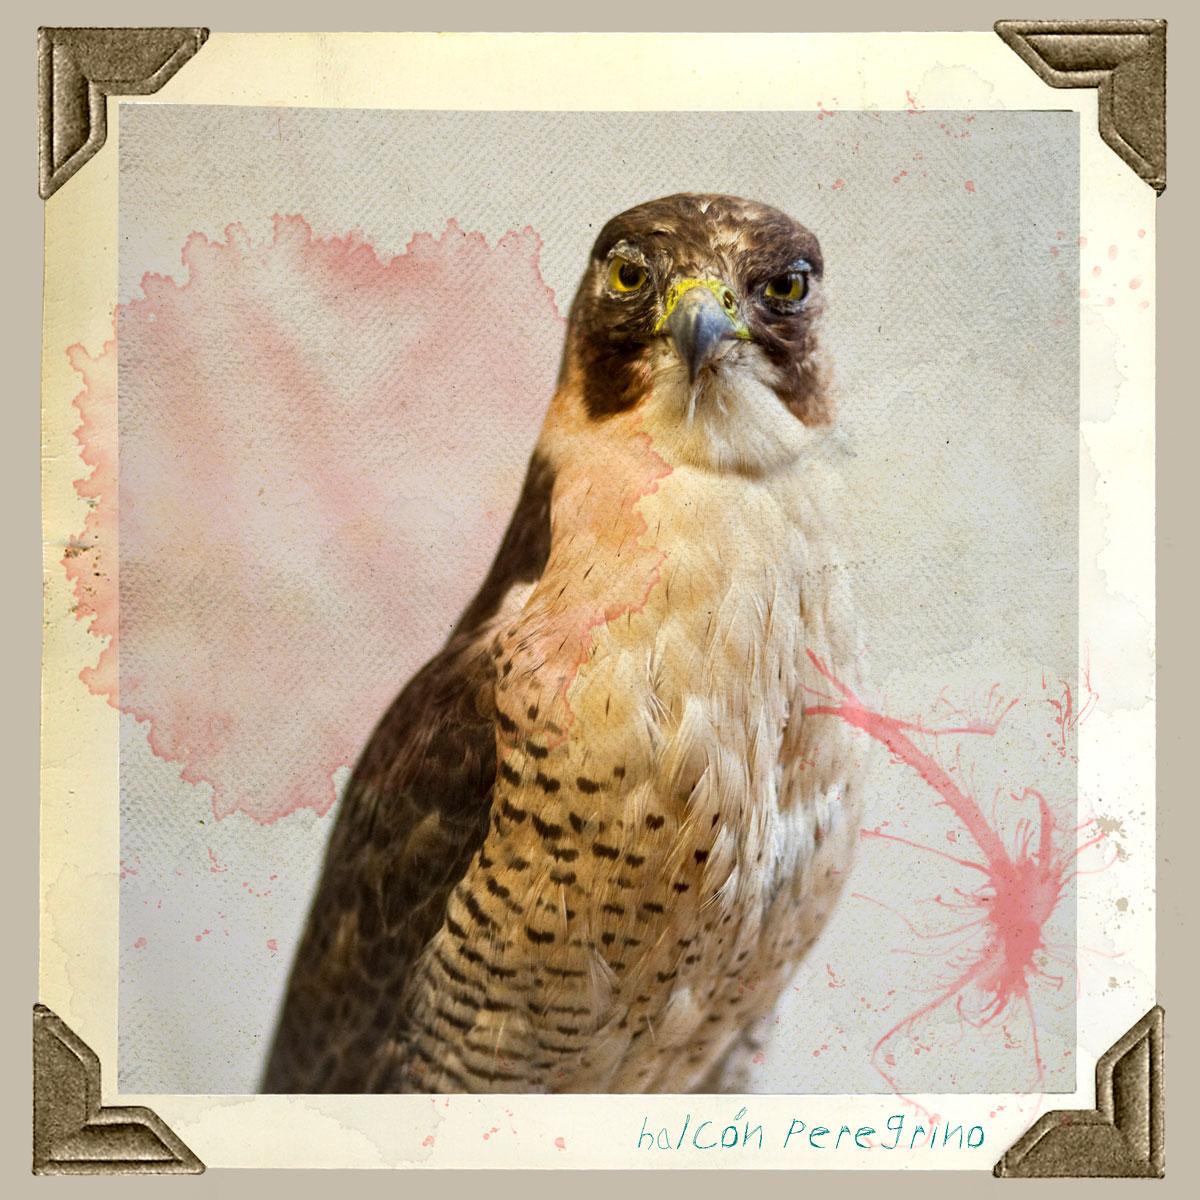 halcon peregrino animal disecado anaima